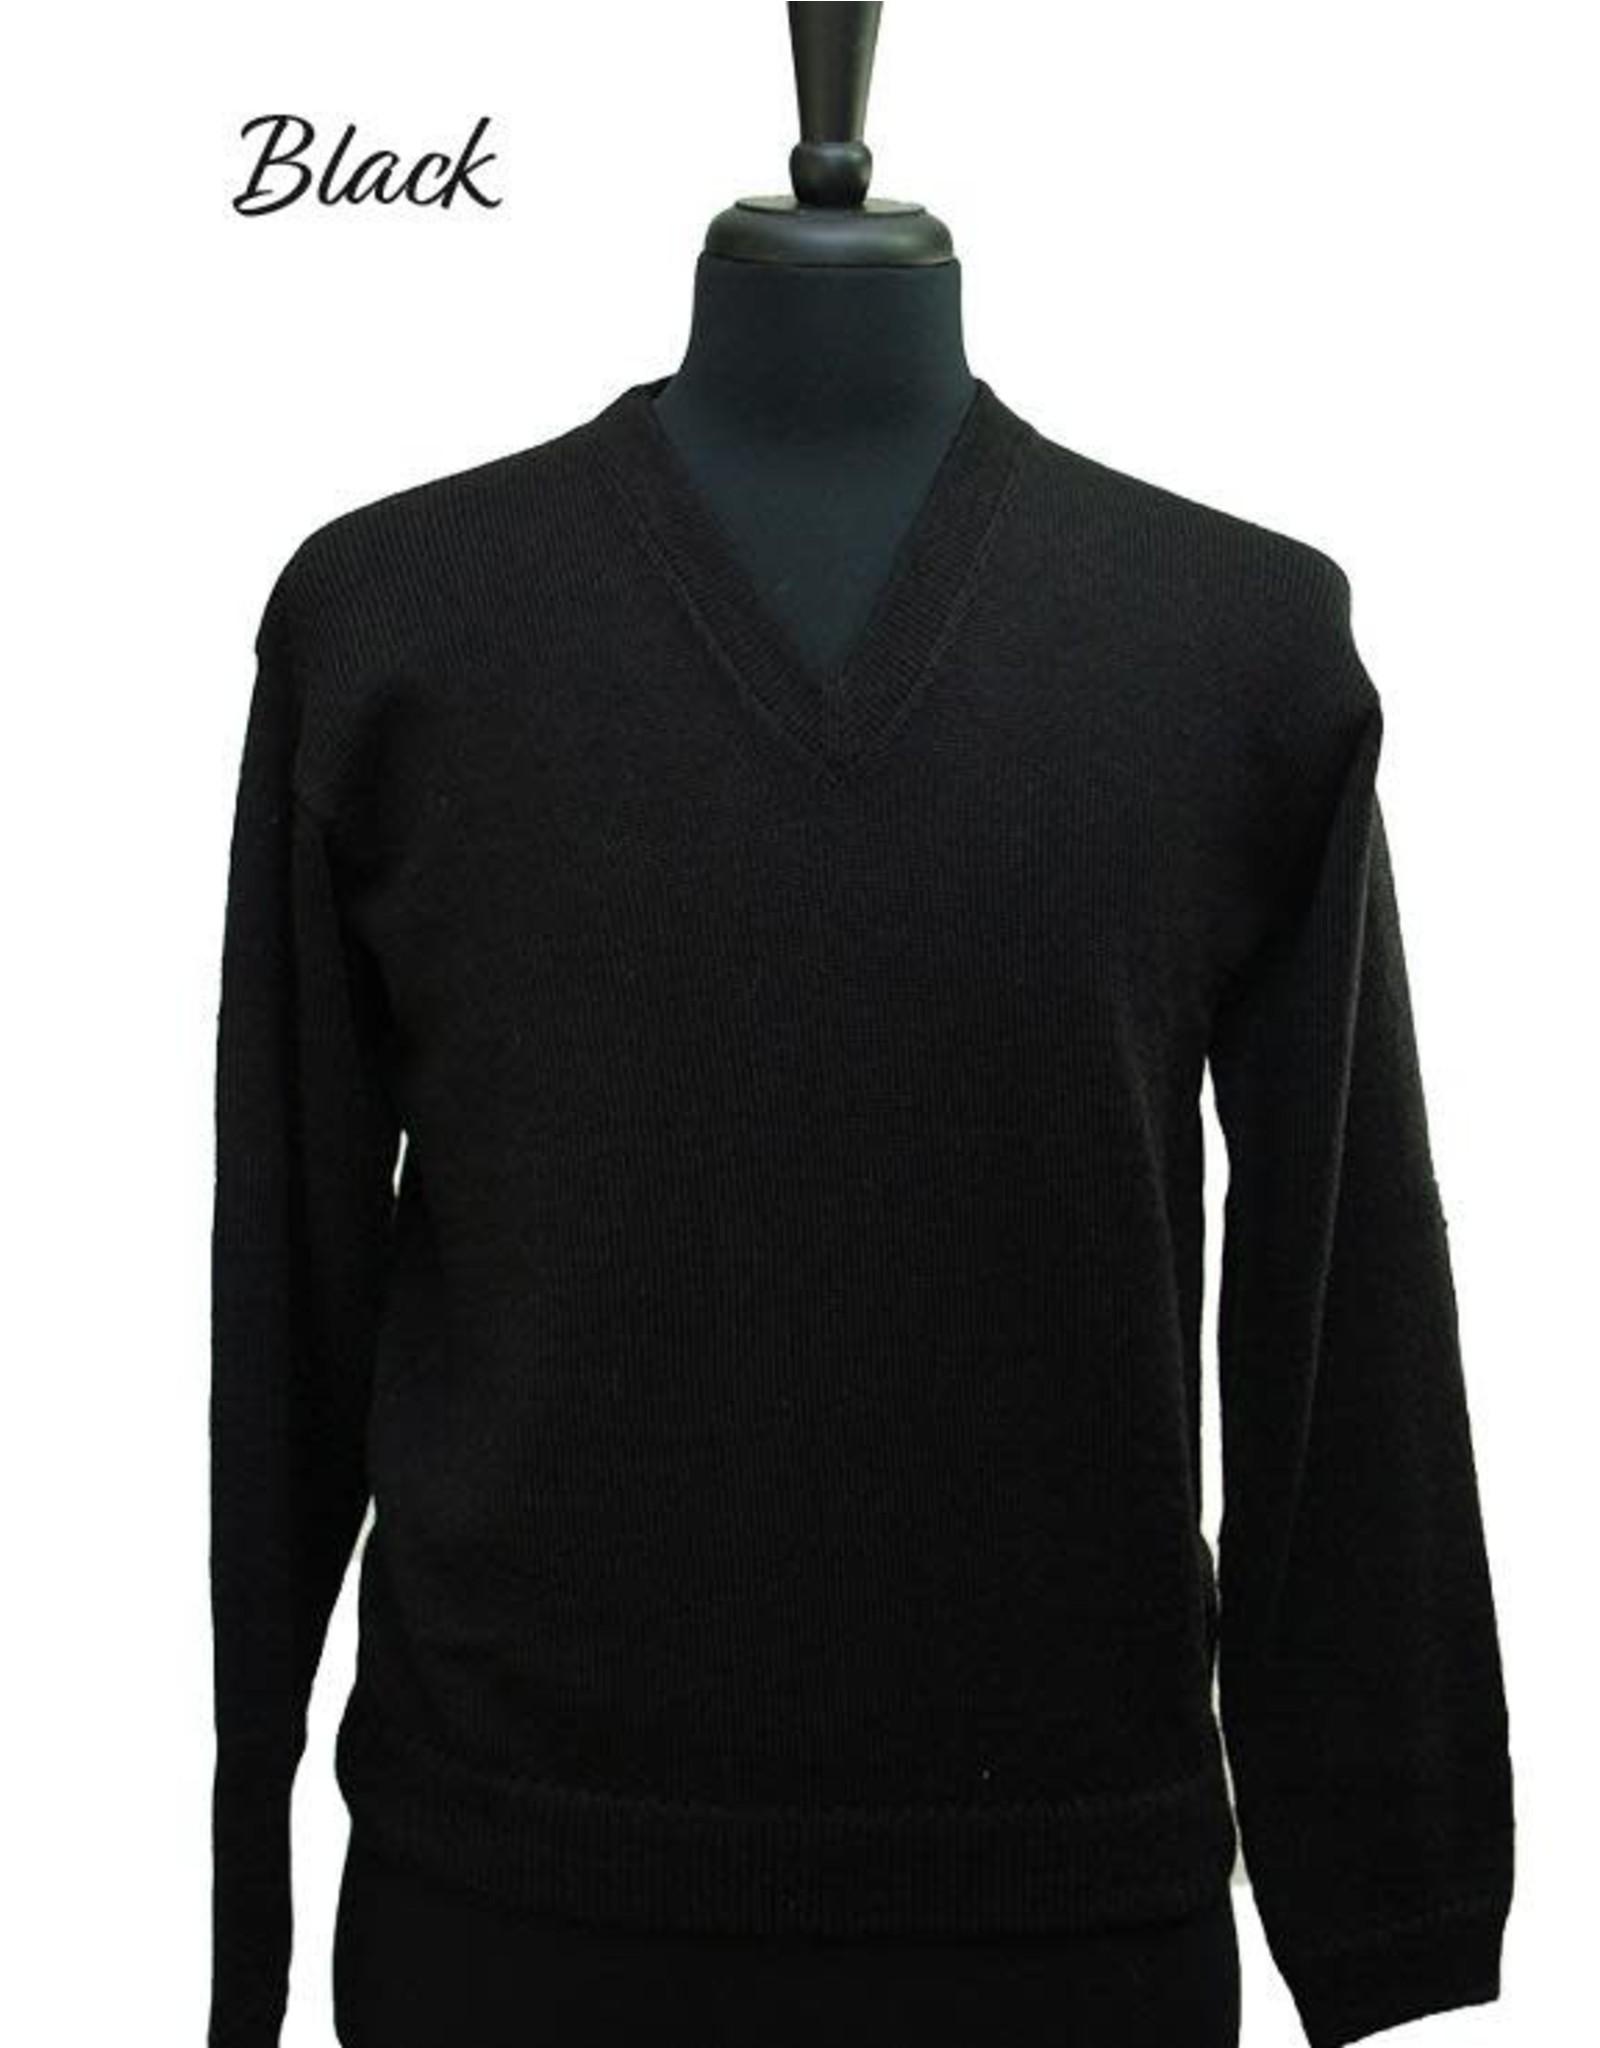 The Sweater Venture Lightweight V-Neck Alpaca Pullover